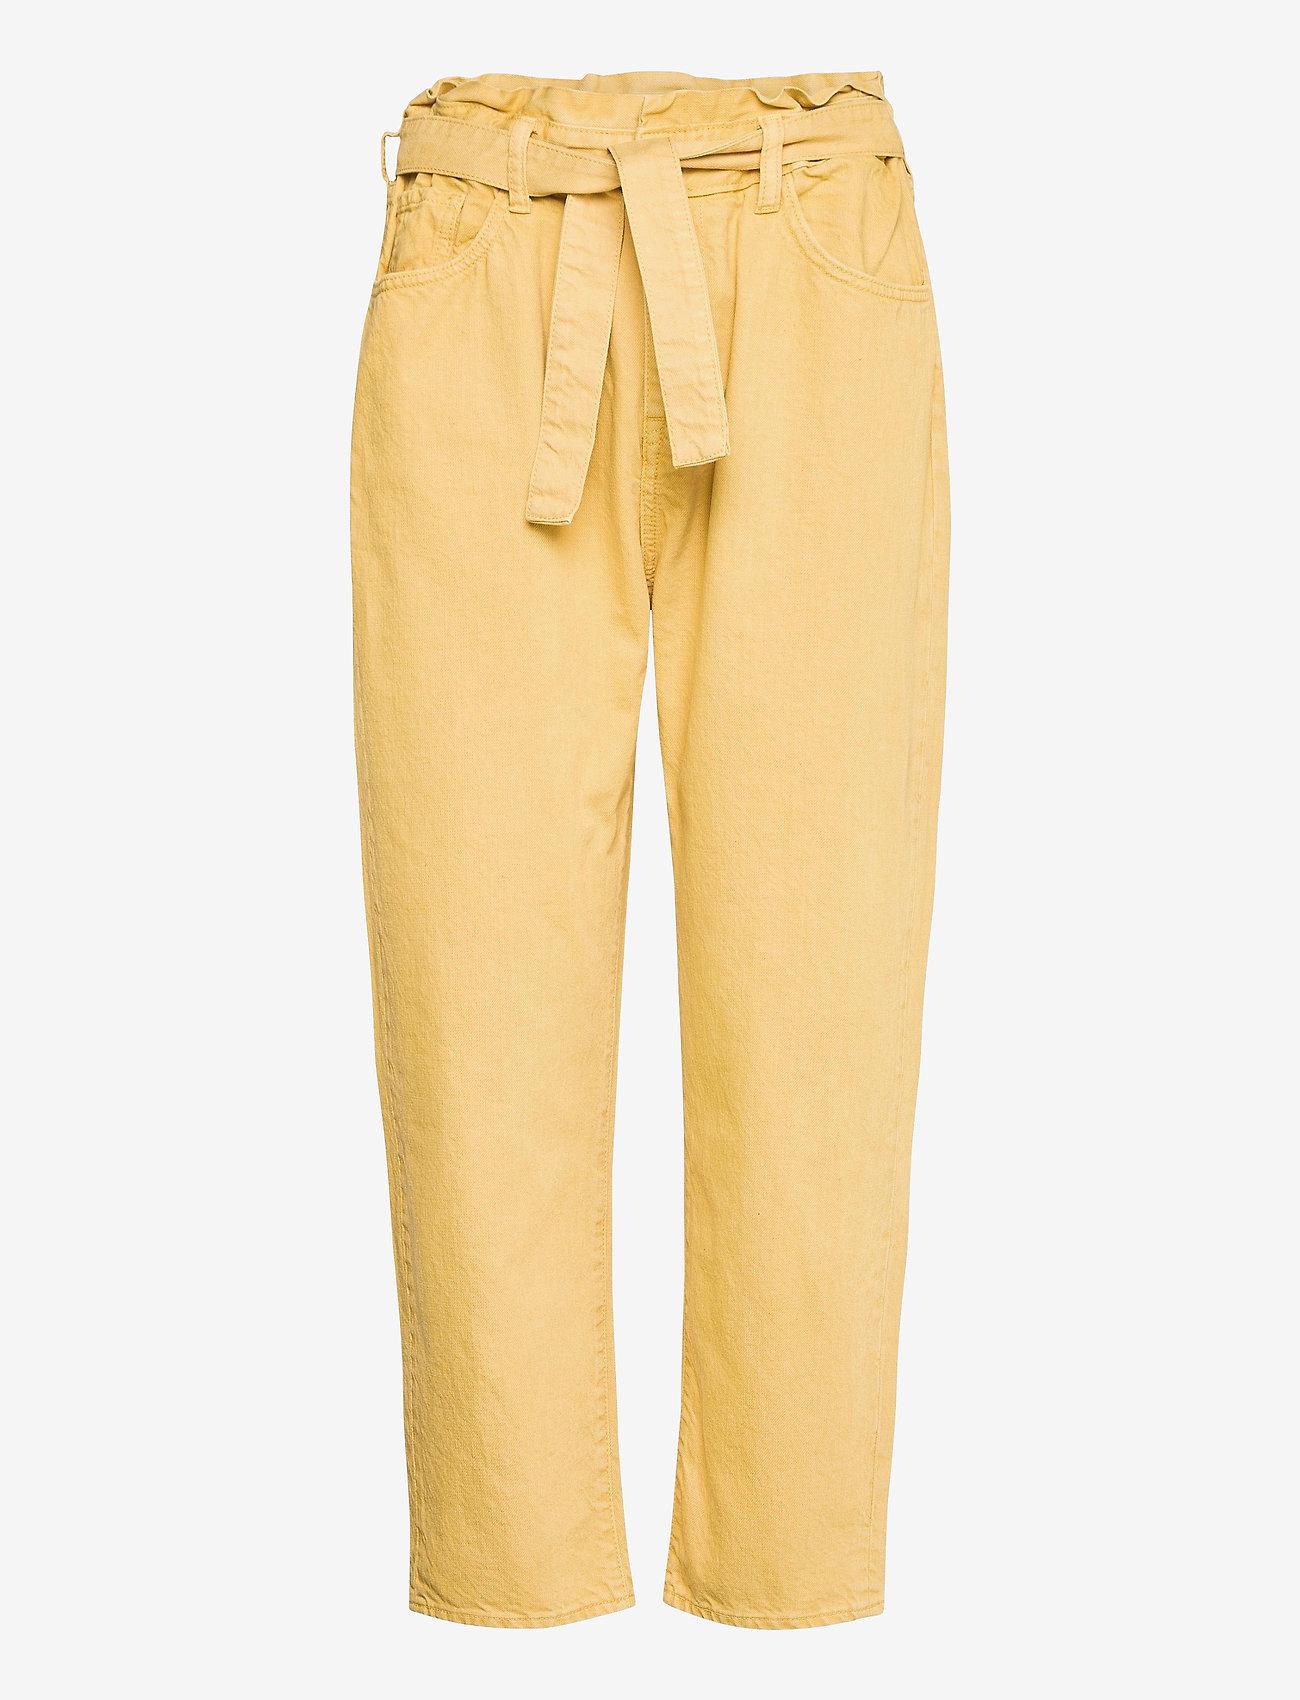 ba&sh - JALIA TROUSERS - mom-jeans - yellow - 1